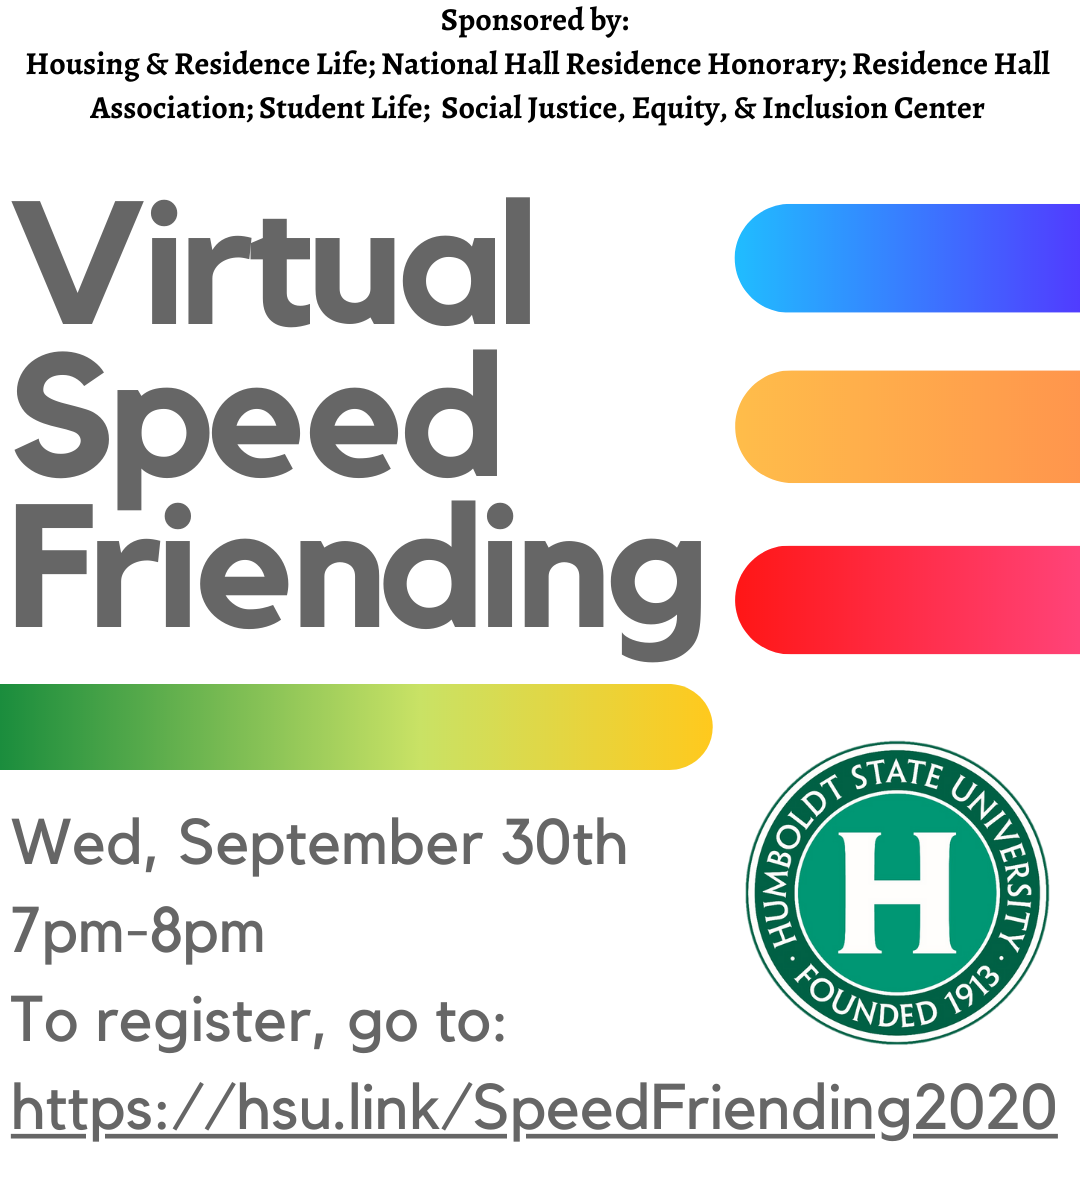 Virtual Speed Friending: Wed, September 30th 7pm-8pm To register, go to: https://hsu.link/SpeedFriending2020